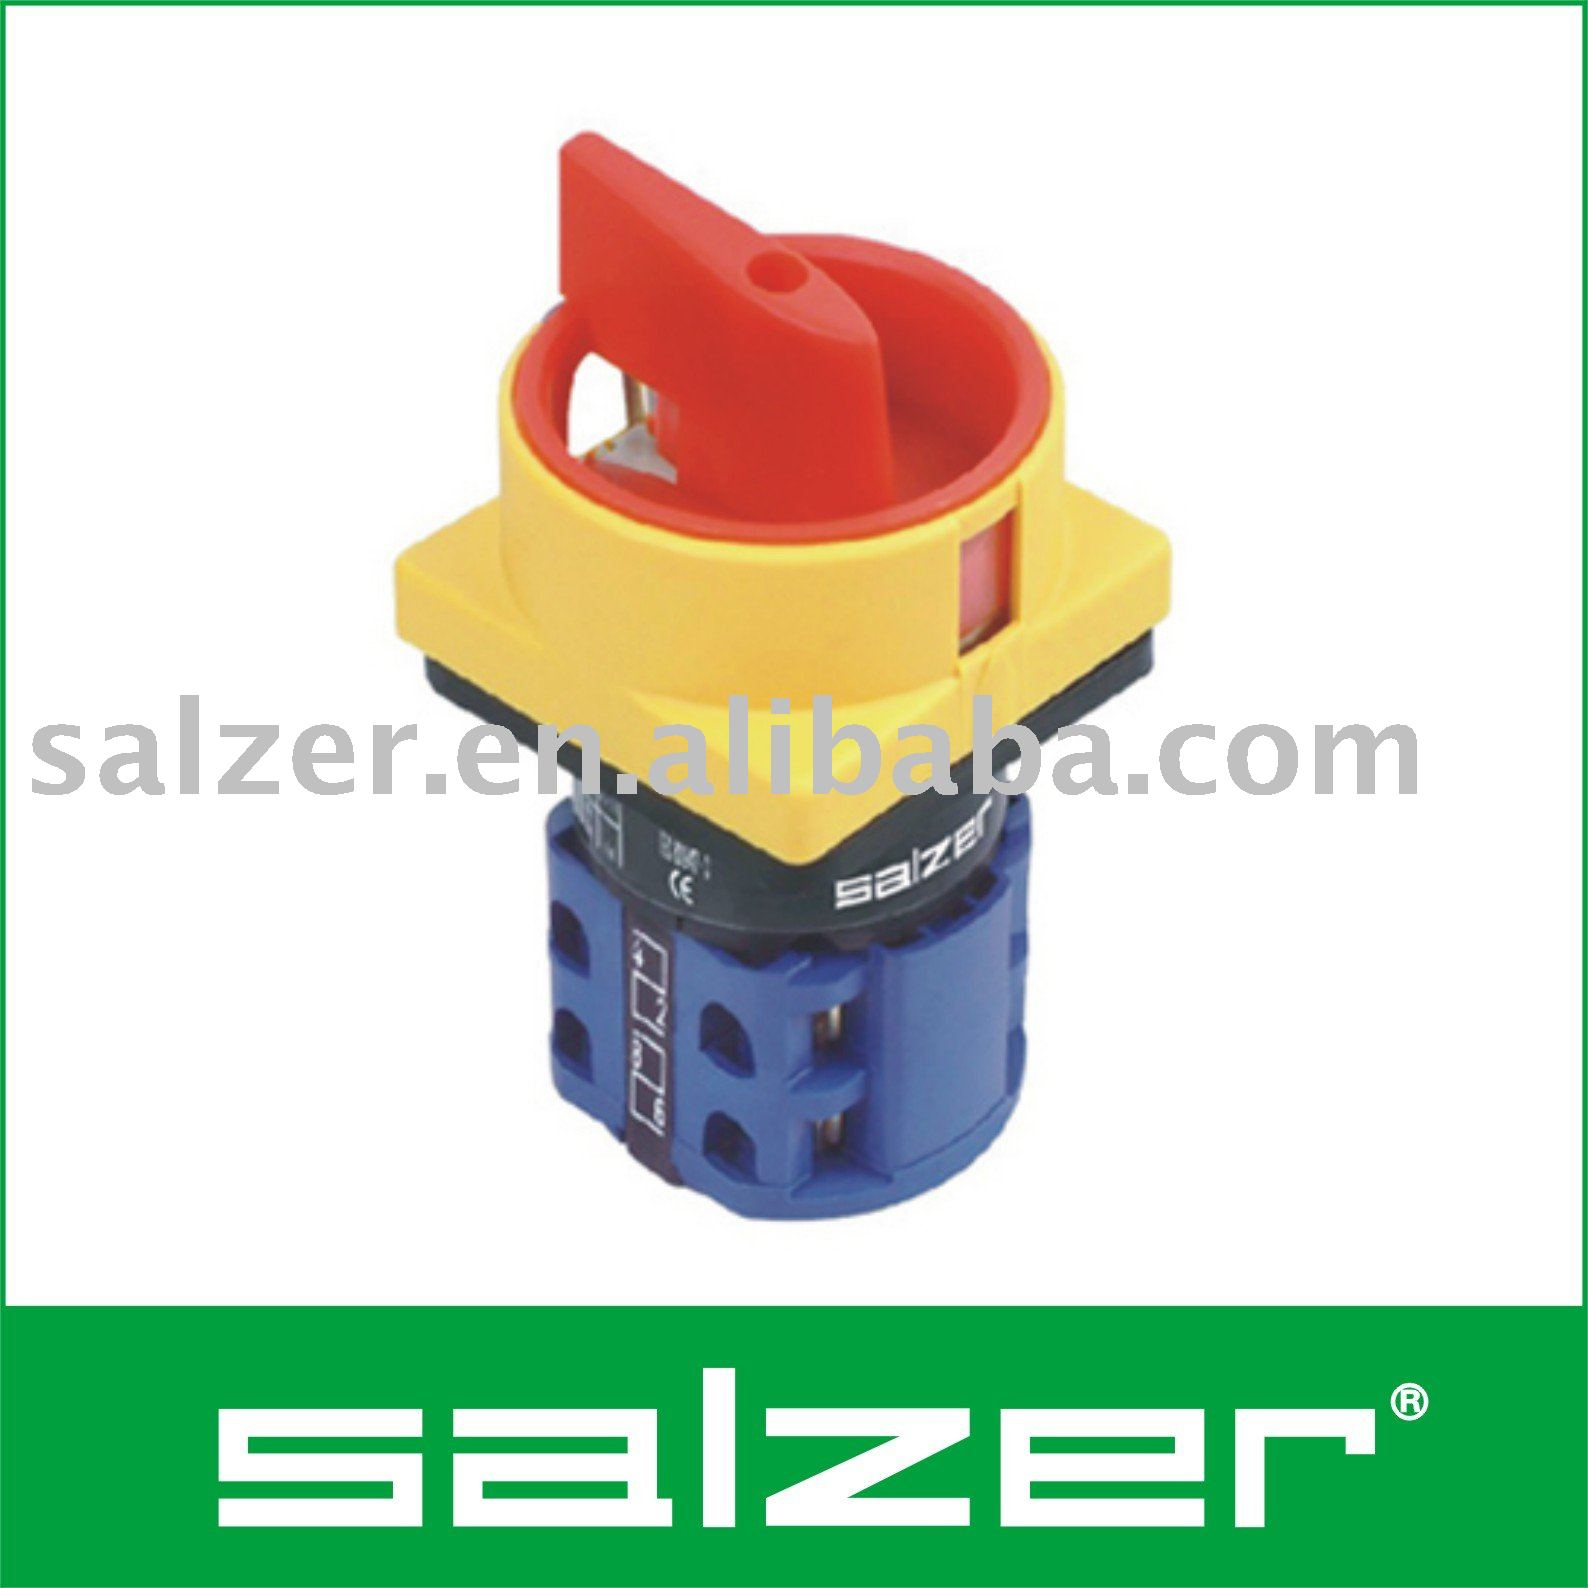 hight resolution of  salzer ac isolator switch off on tuv salzer ac isolator switch off on tuv ce